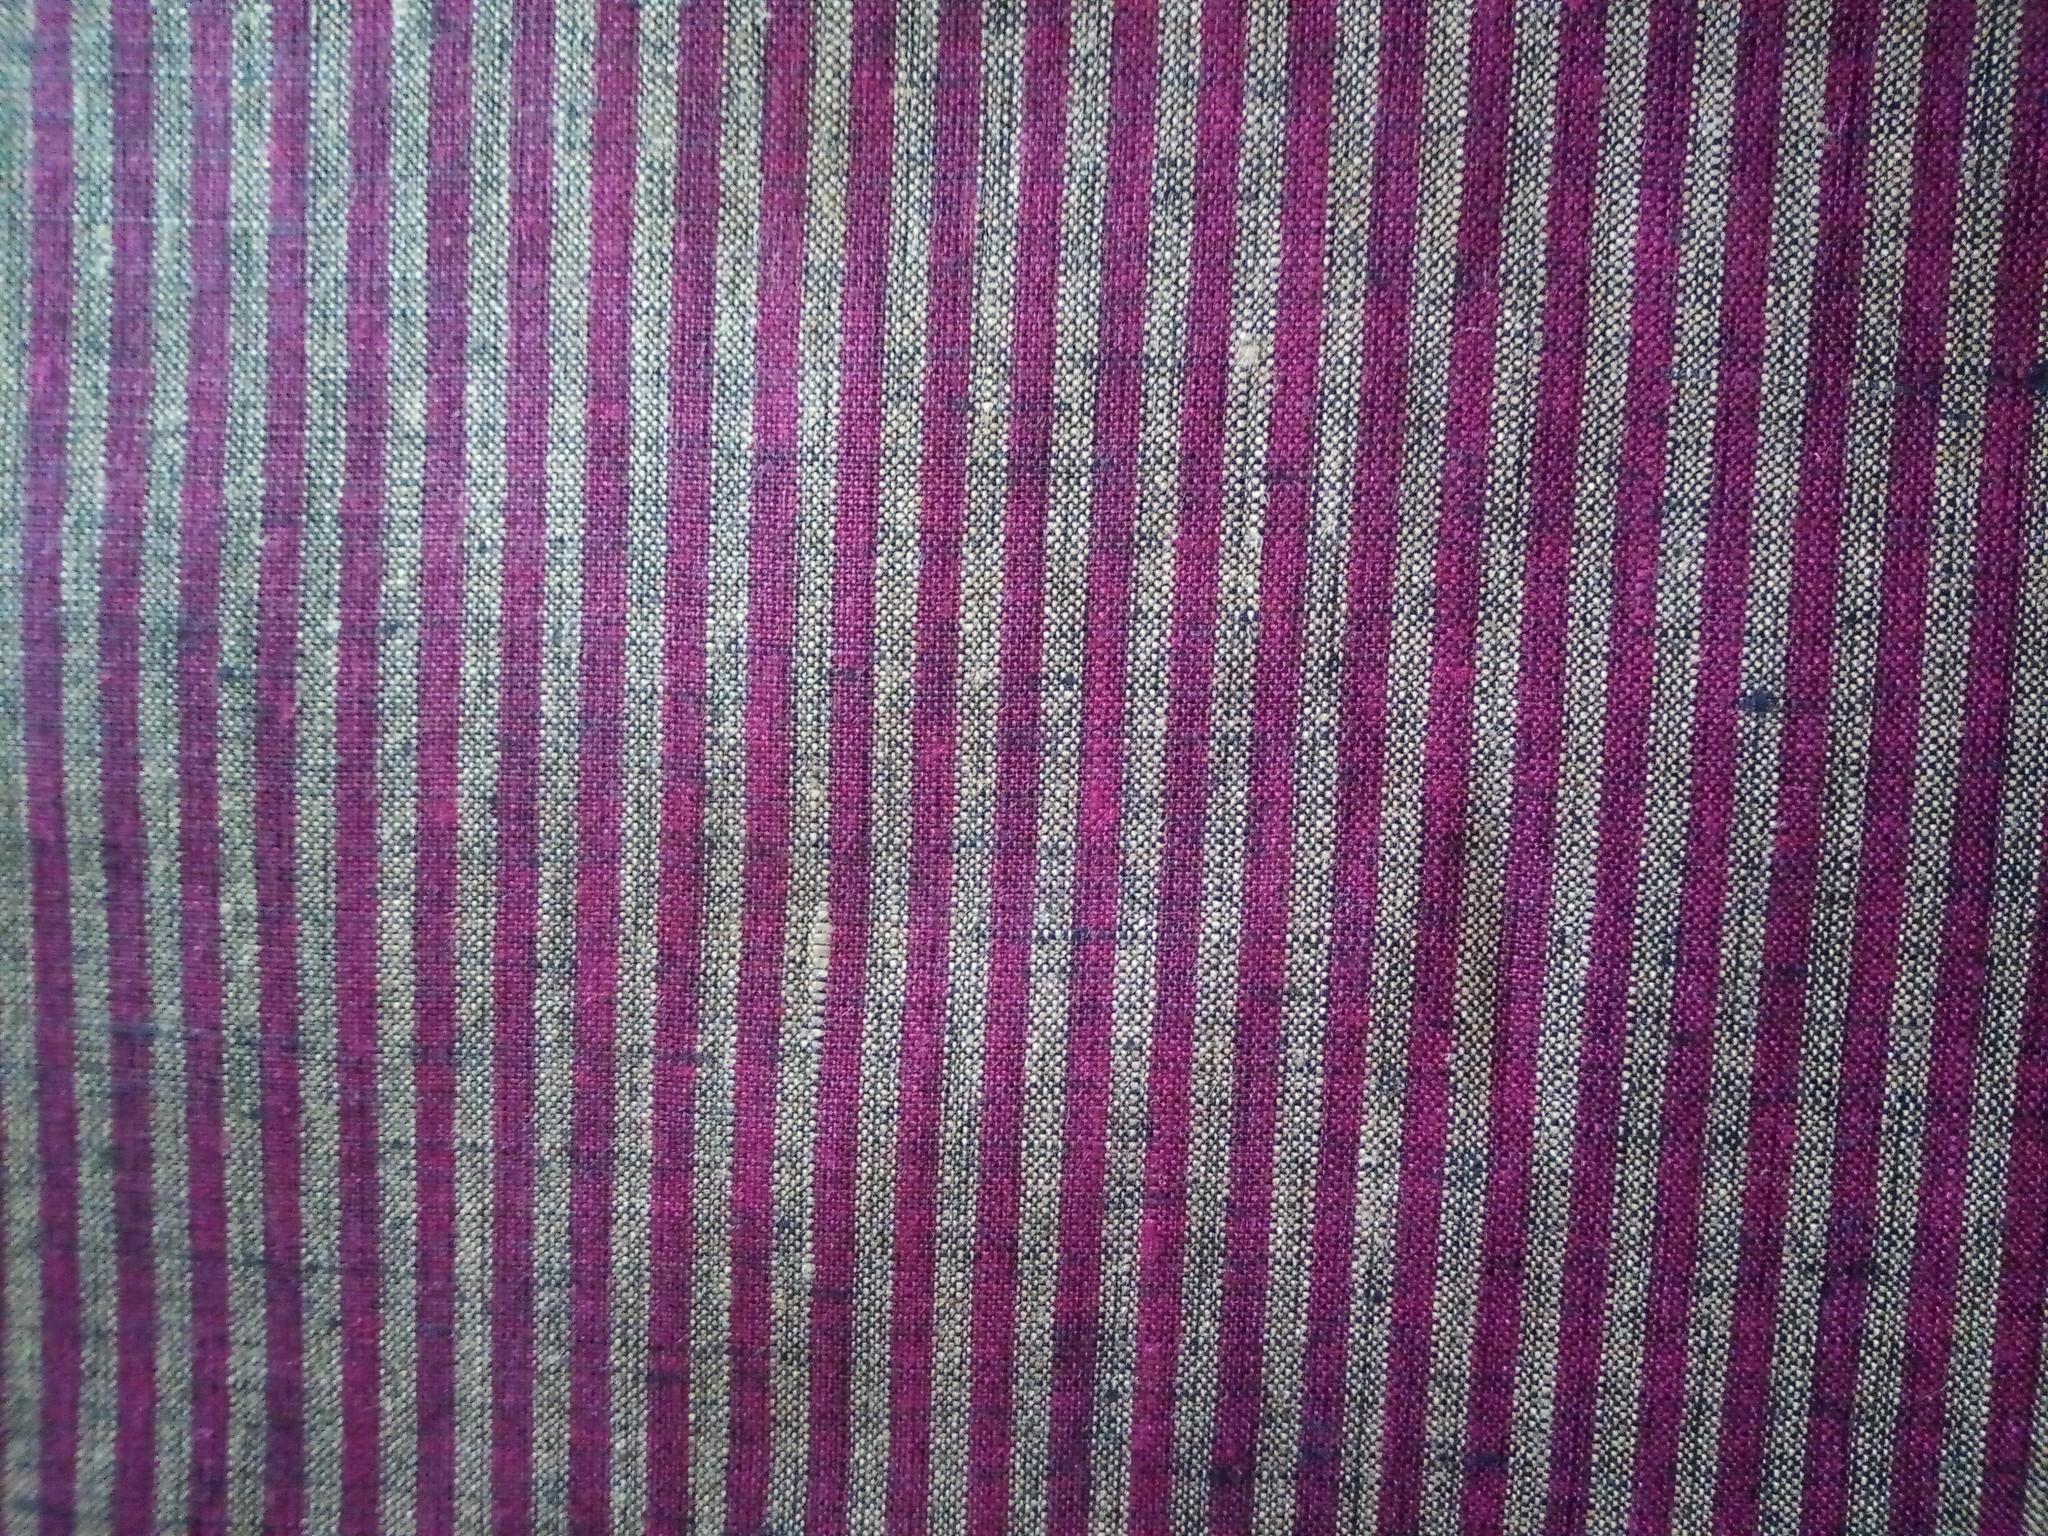 Purple striped fabric